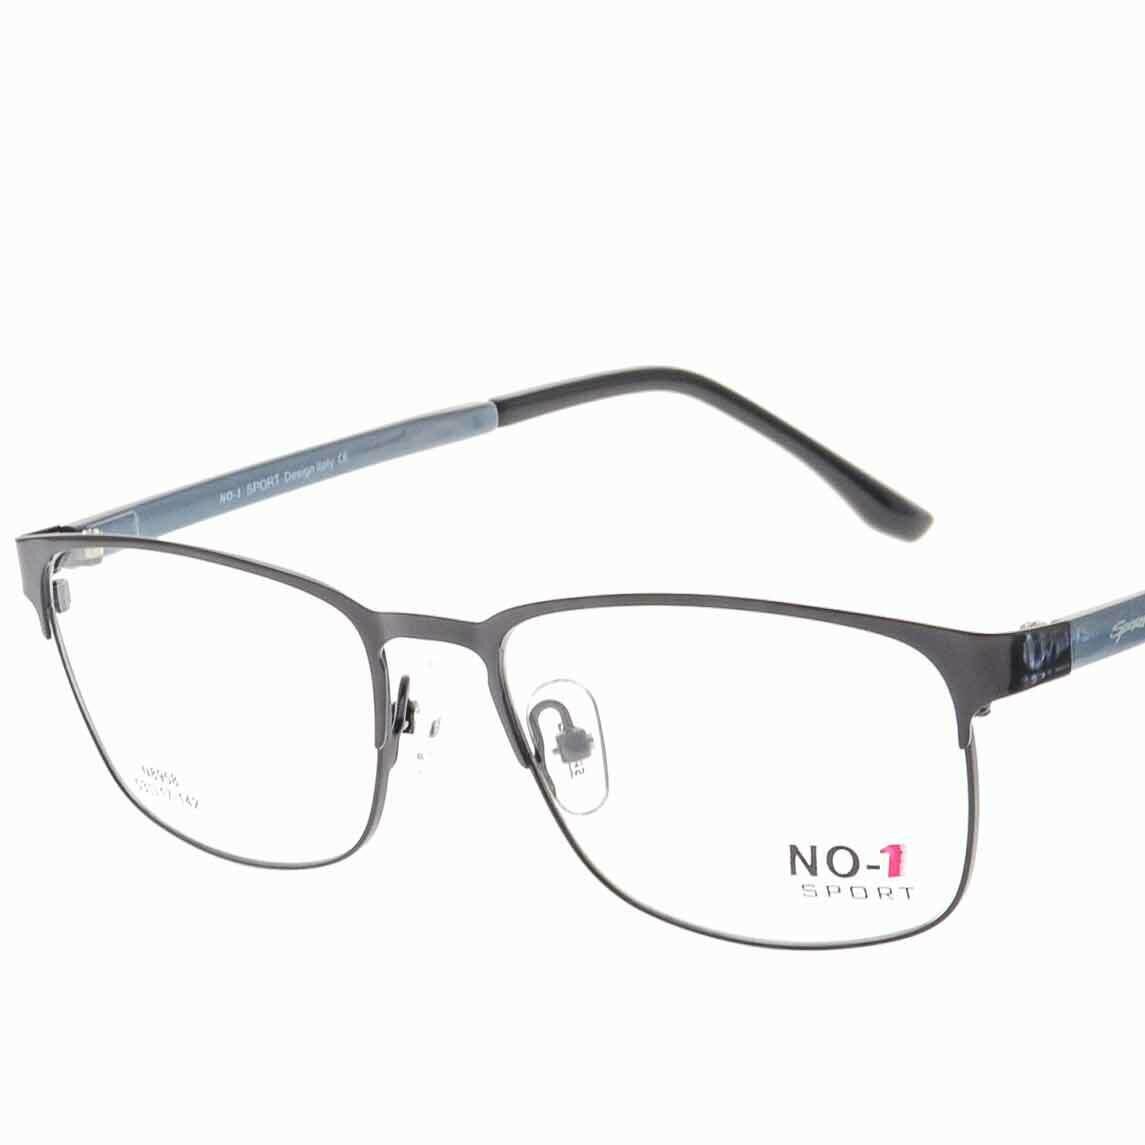 NO-1 SPORT N8958